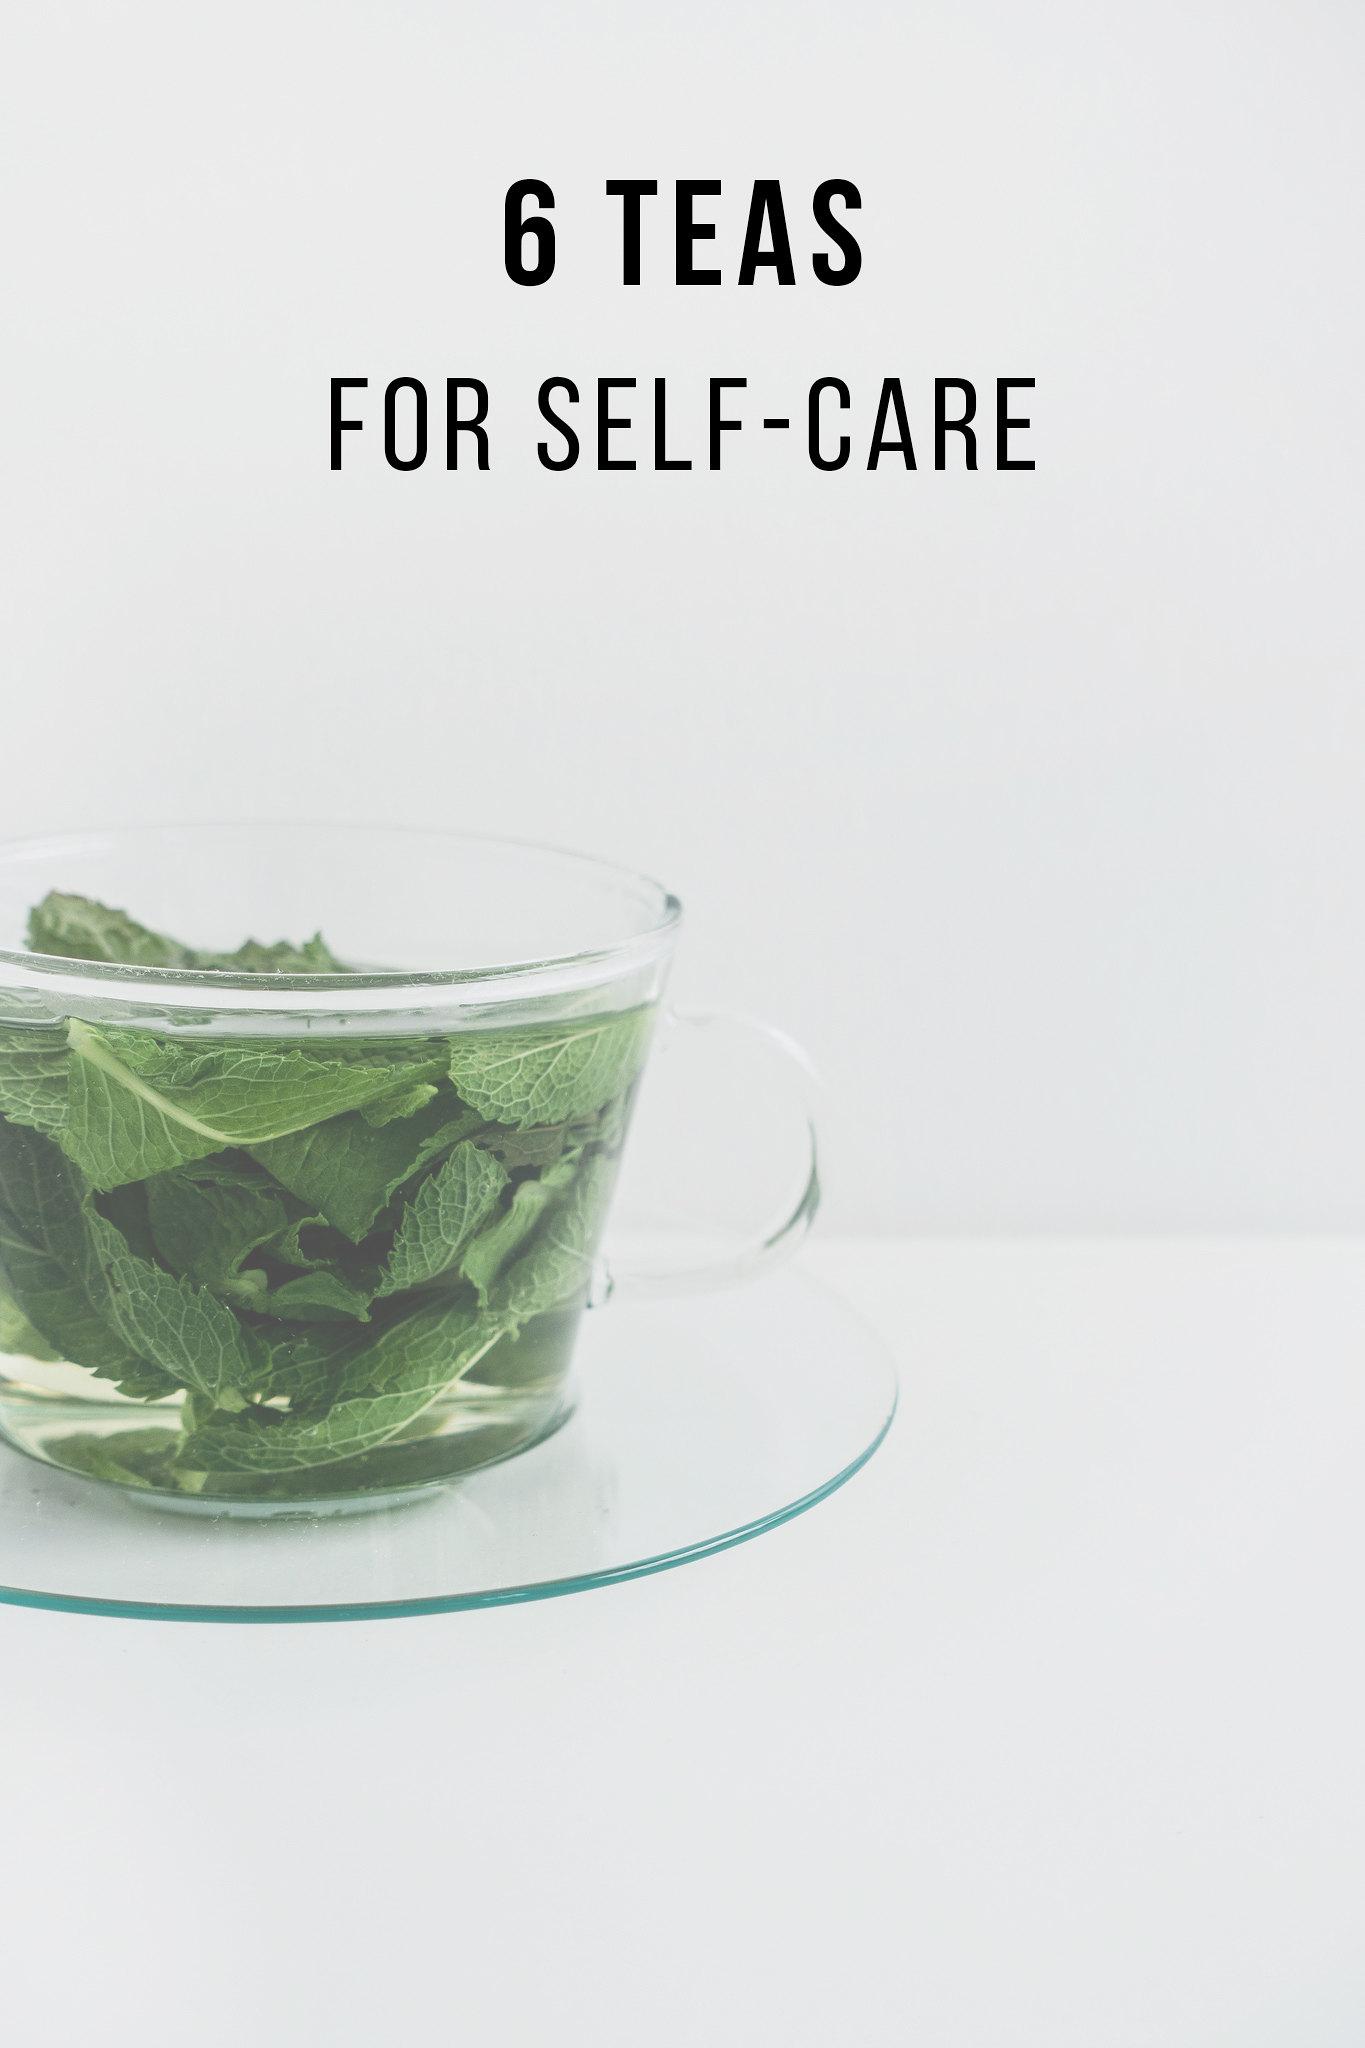 6 Teas For Self-Care